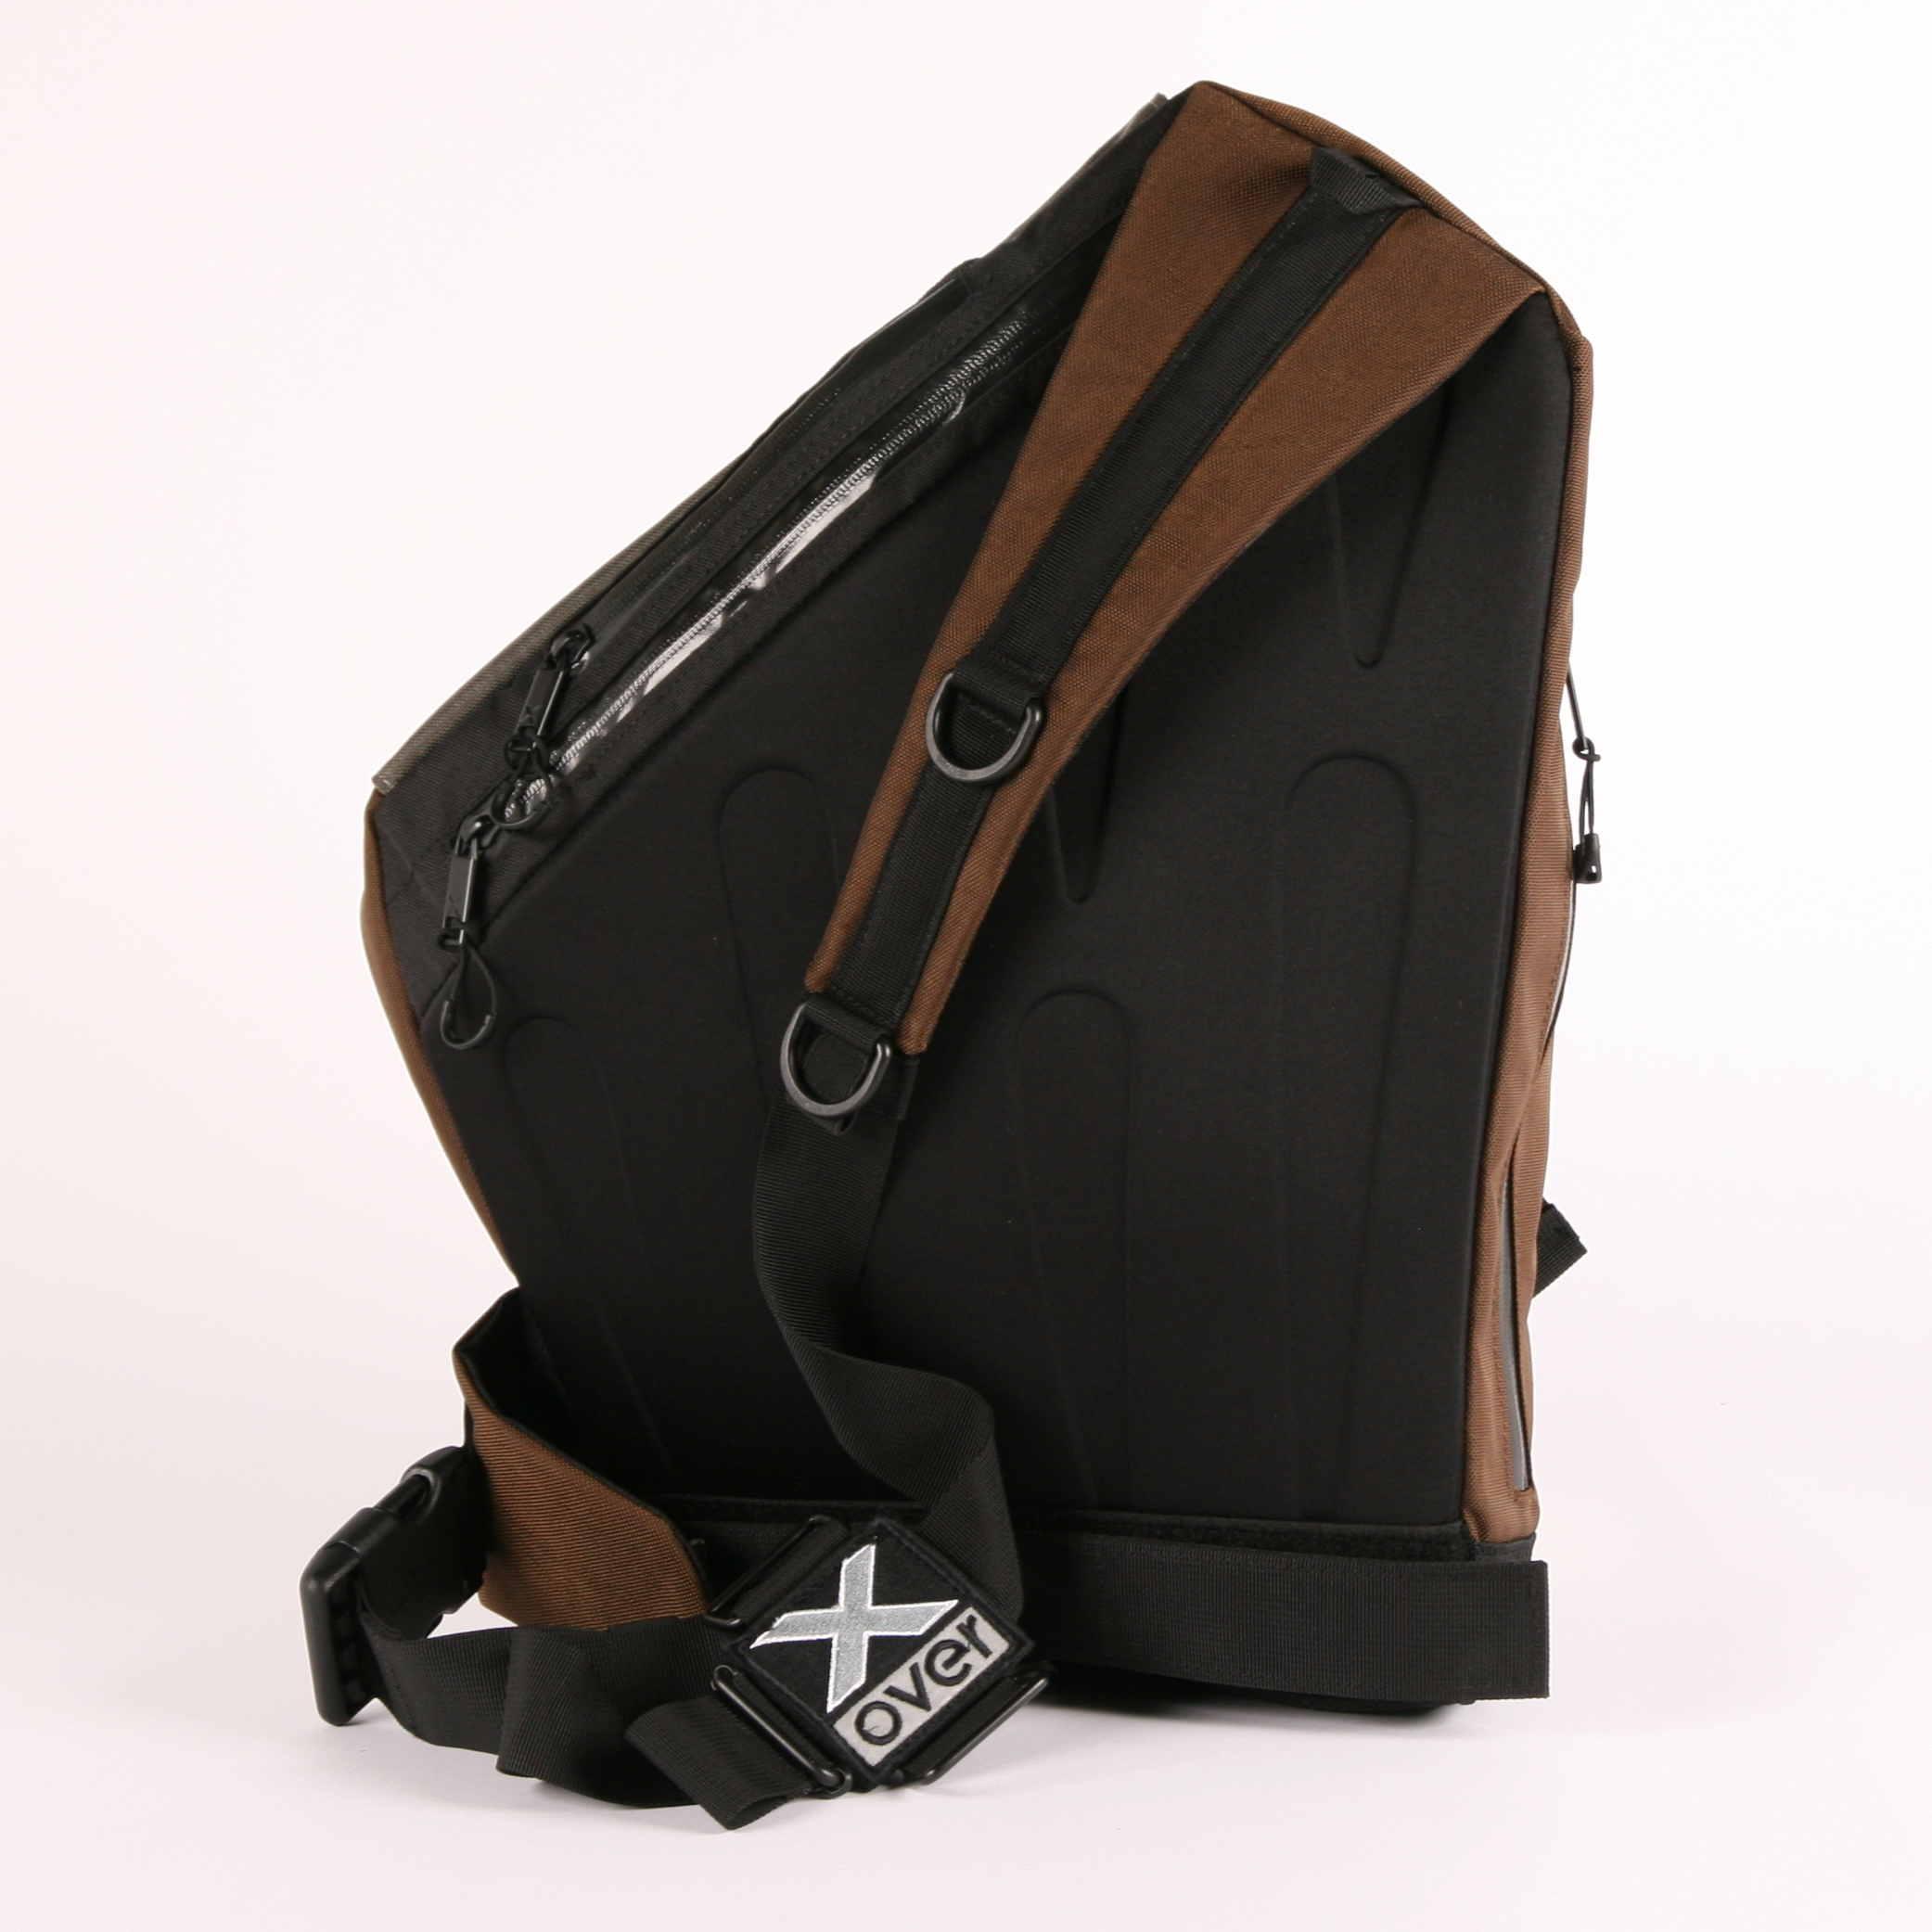 X-Over schuine rugzak wintersports achterkant